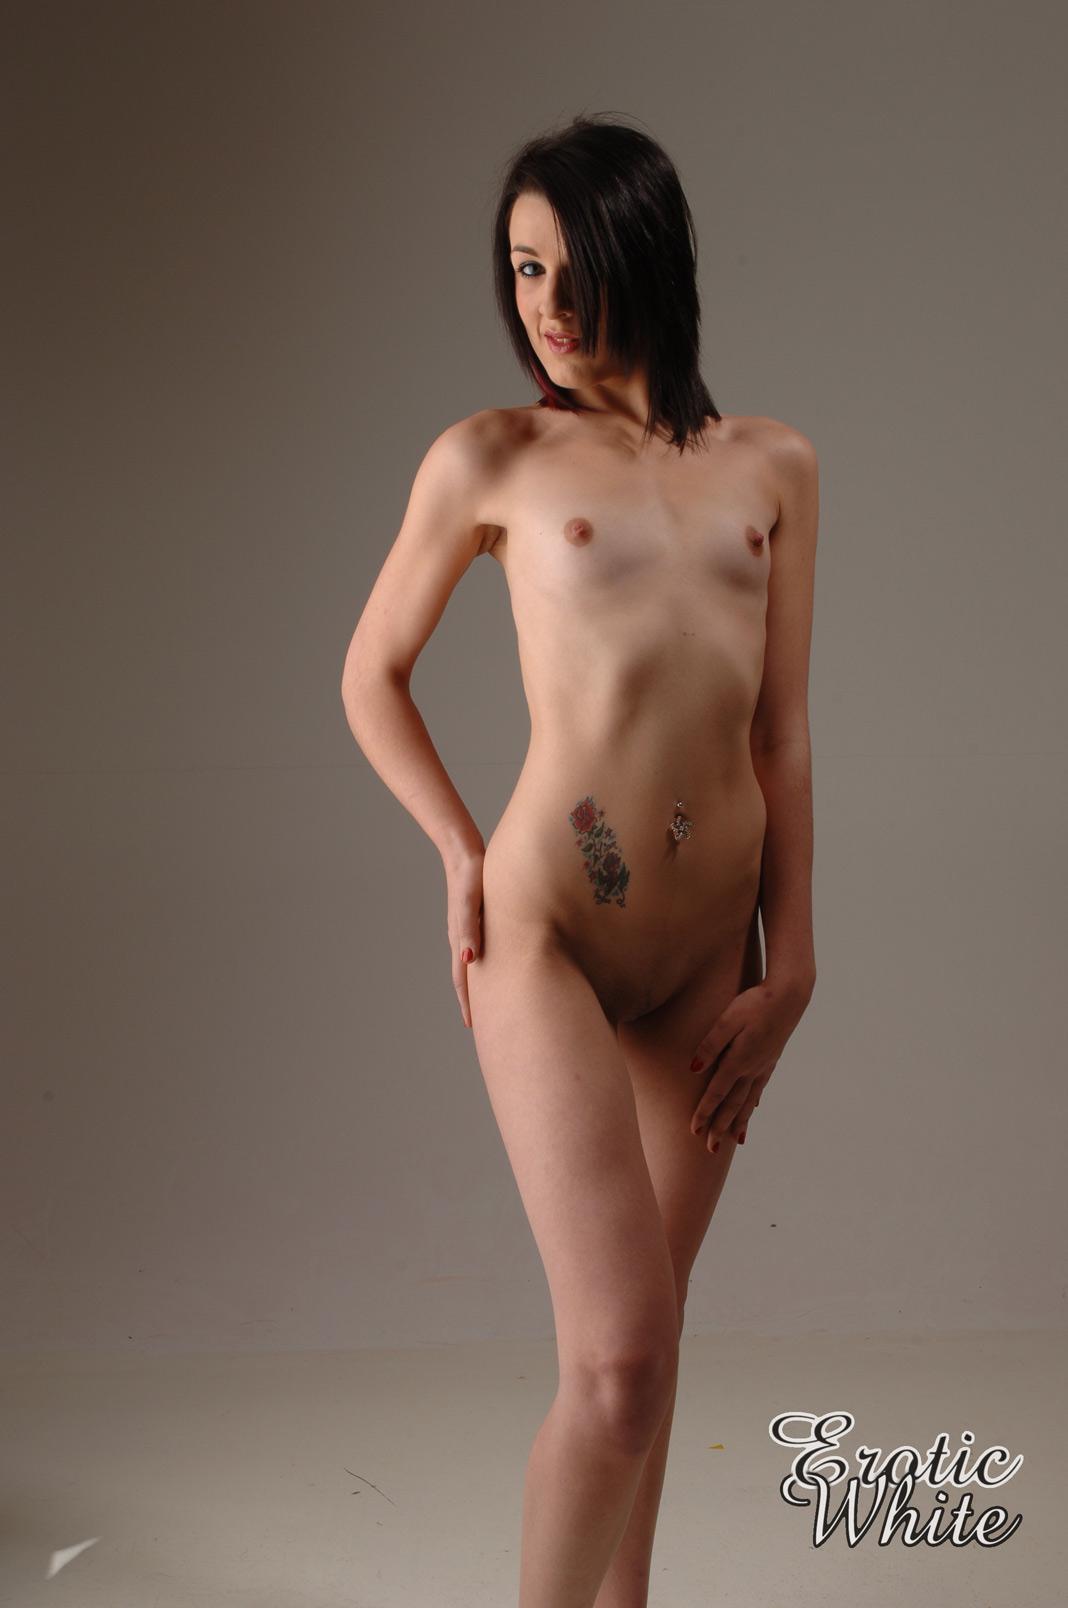 fnude flat chested boobs